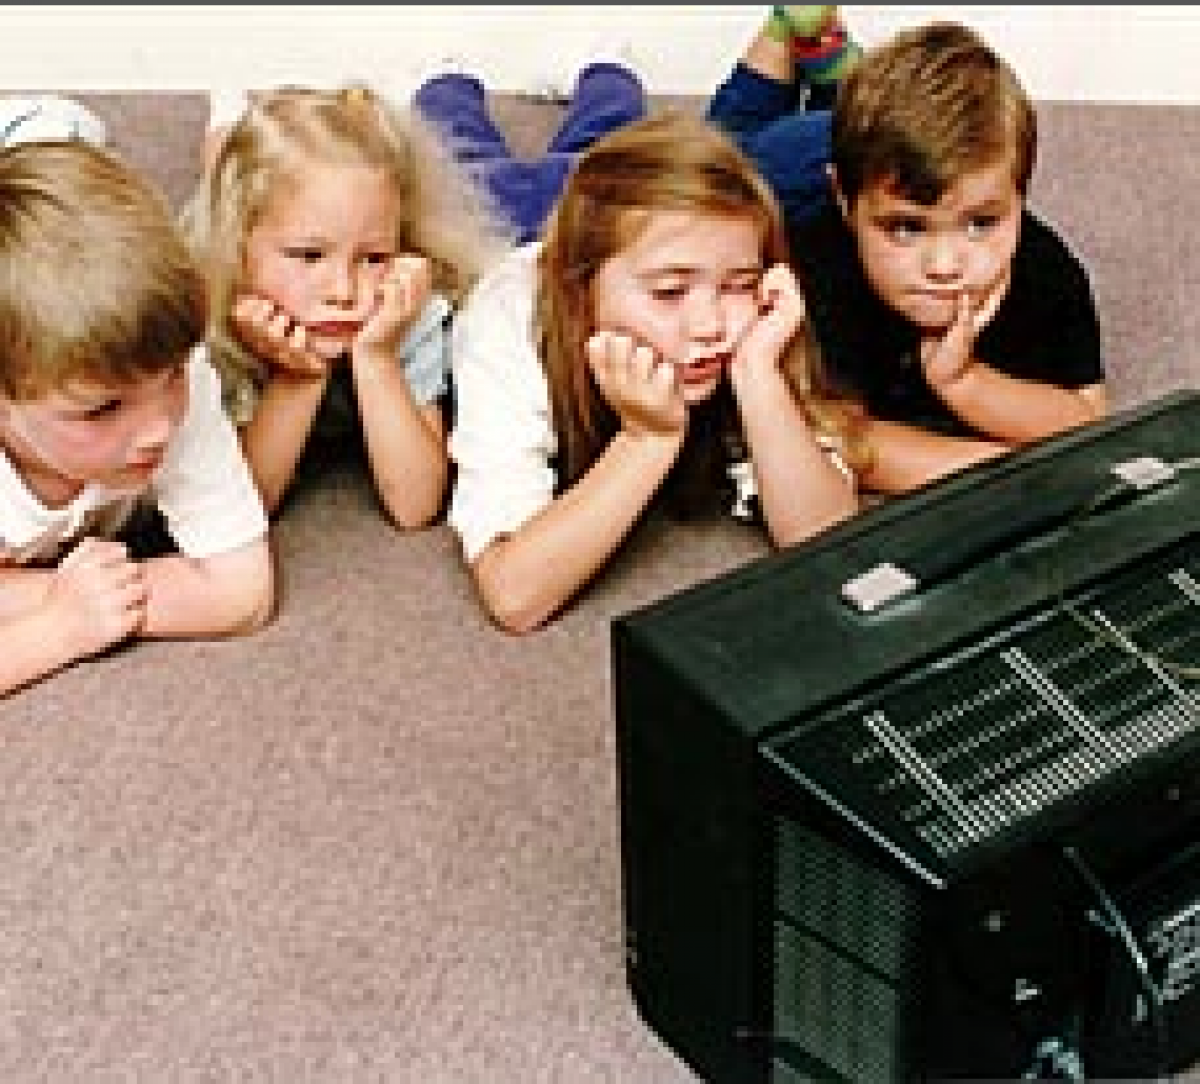 TV or not TV: Παρακολούθηση κινούμενης εικόνας από παιδιά κάτω των δύο ετών